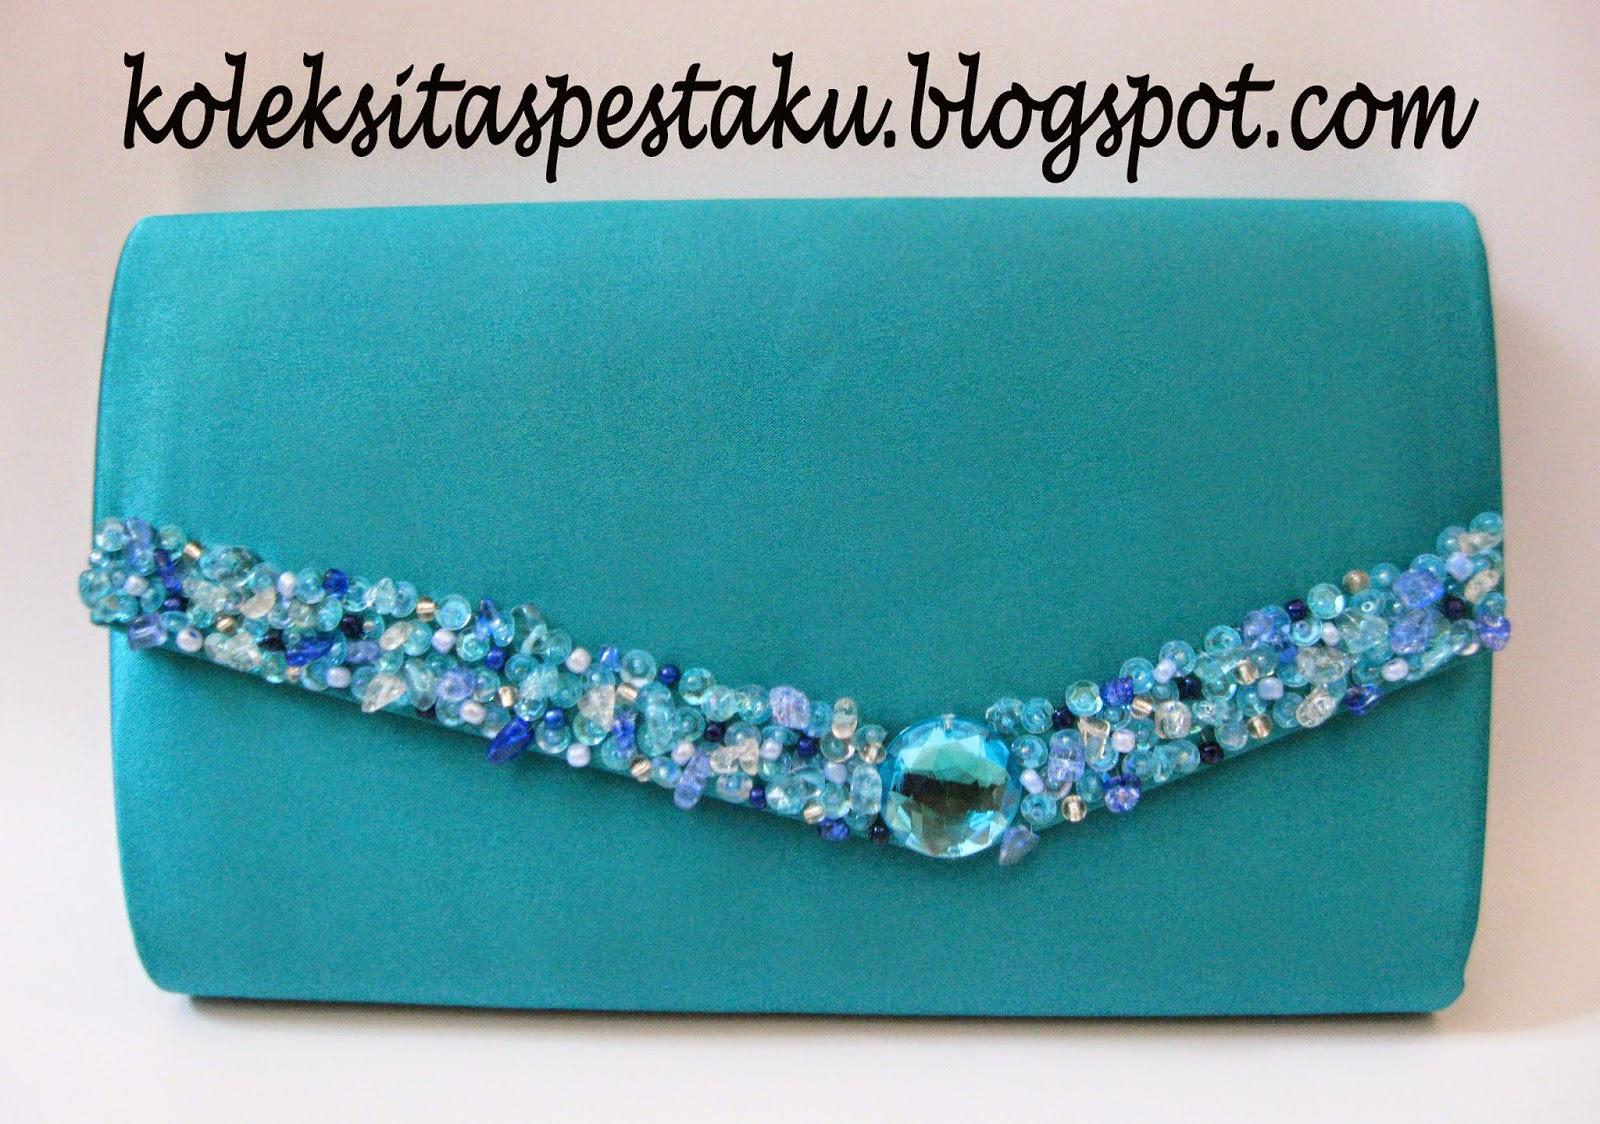 Tas Pesta - Clutch Bag  taspestaku  Cantik dan Elegant Biru Tosca ... f700a1a9e0